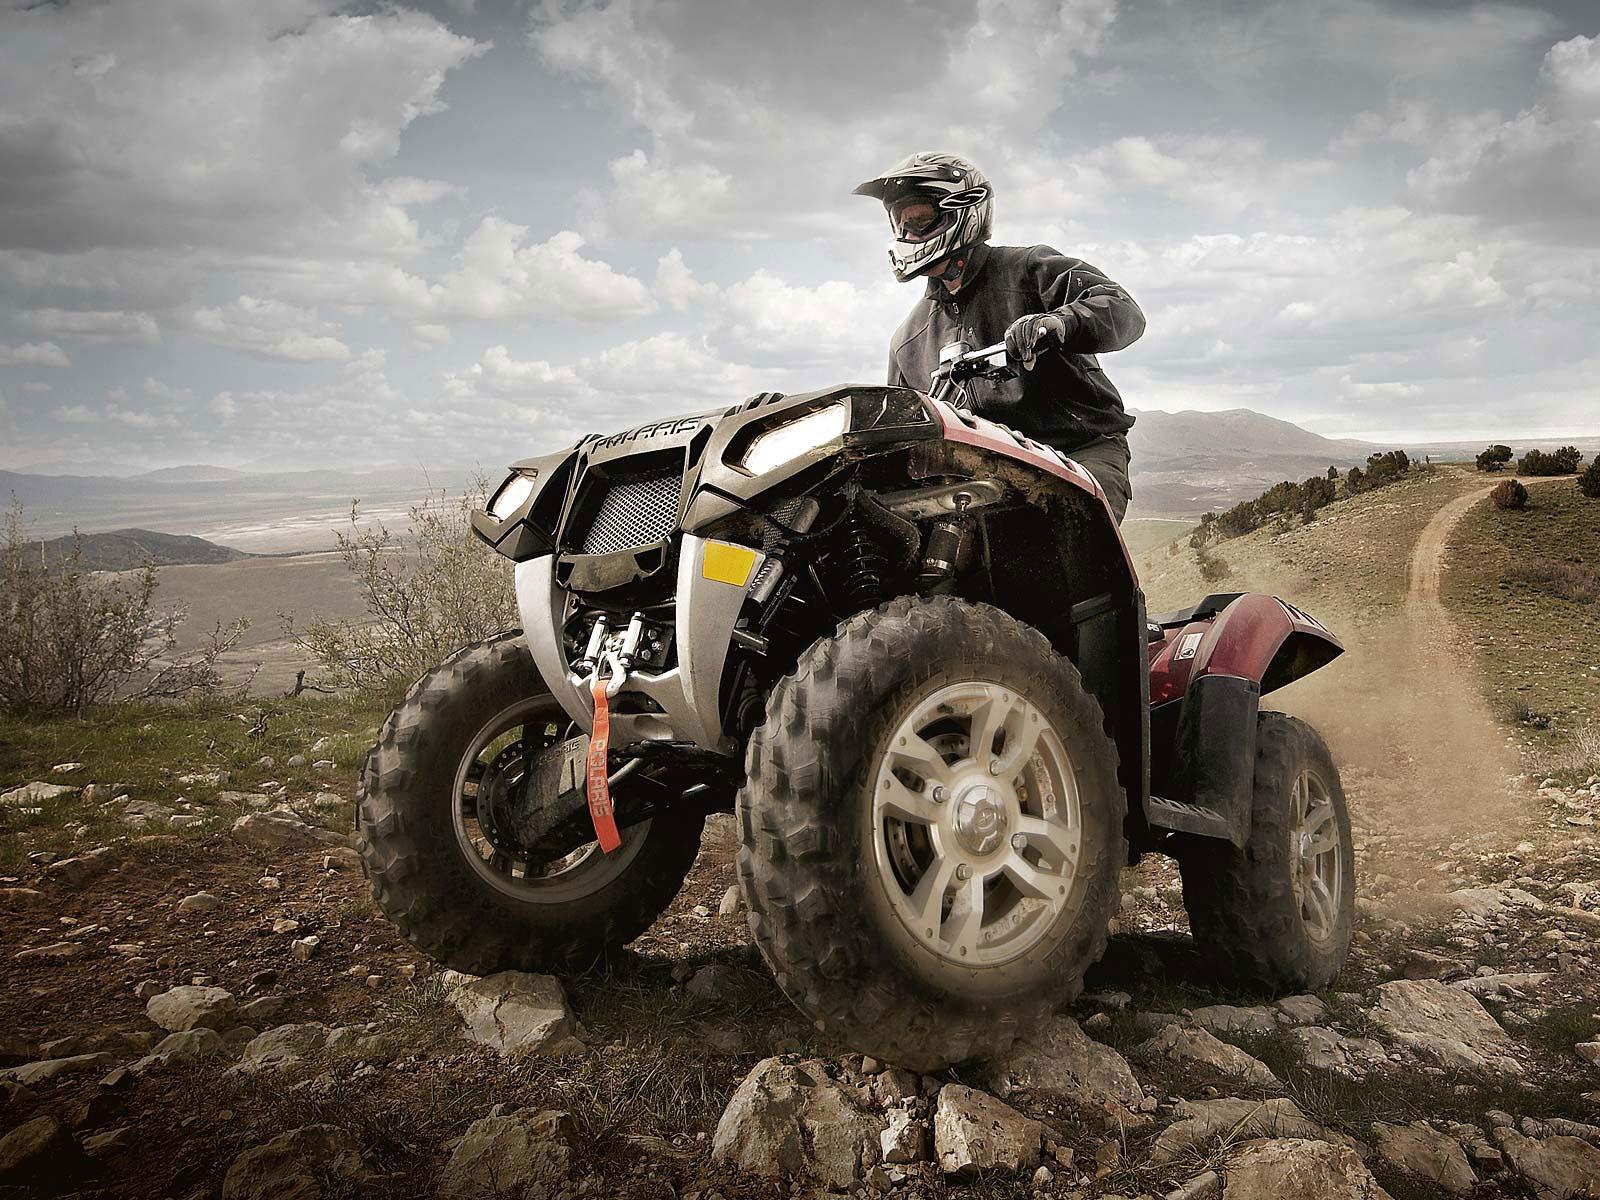 2009 POLARIS Sportsman XP850EFI ATV wallpapers 1600x1200